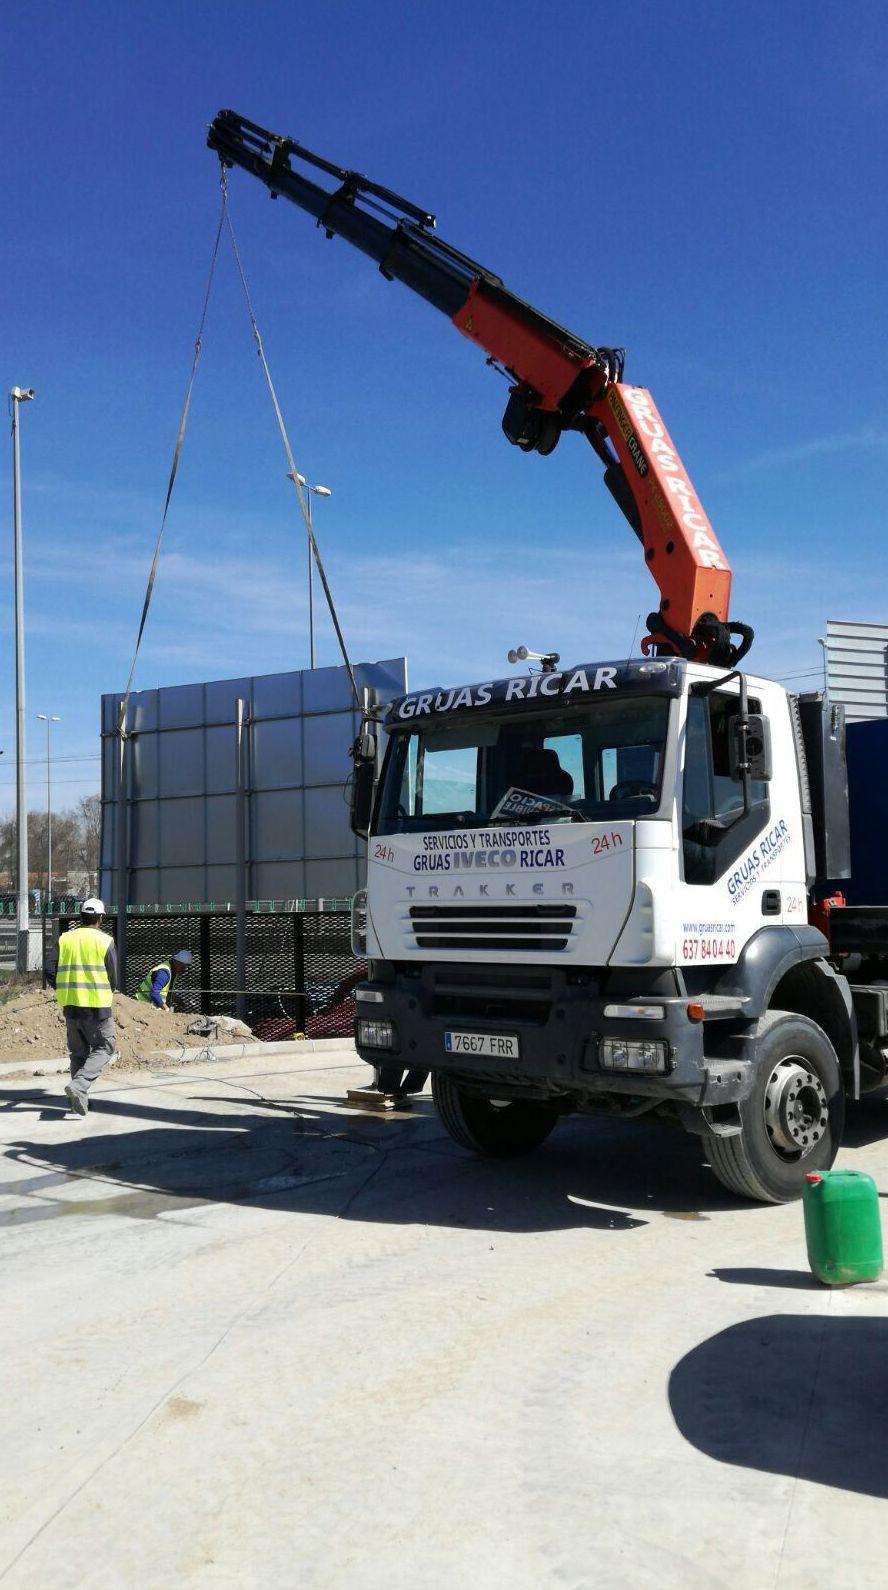 Foto 4 de Efectivos servicios de alquiler de grúas para obras en Torrejón de la Calzada | Grúas Ricar